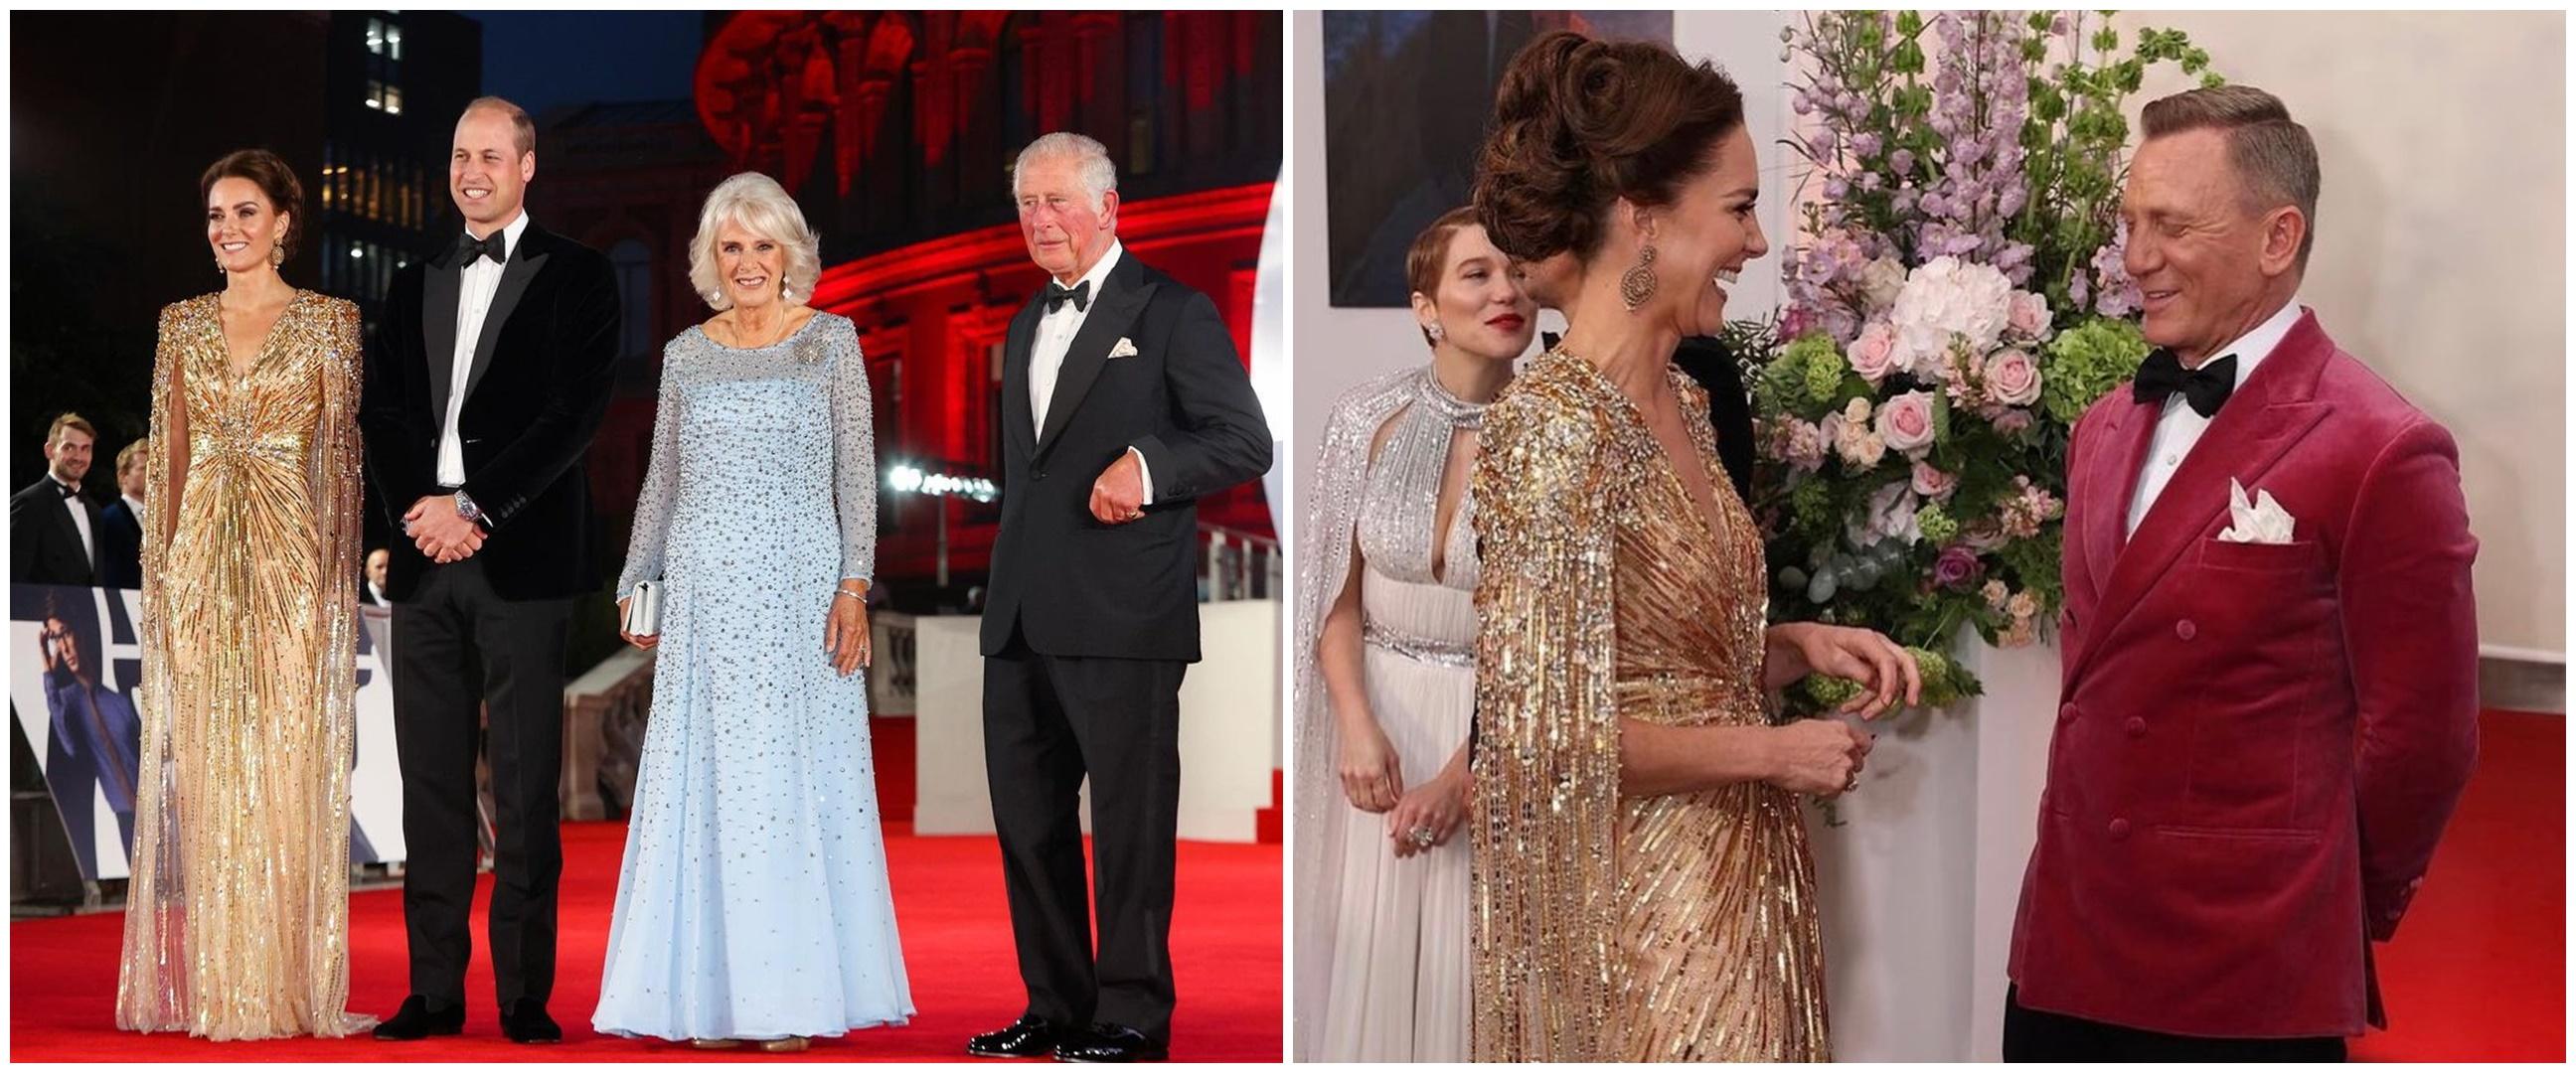 7 Potret Kate Middleton hadiri premier film James Bond, tampil glamor